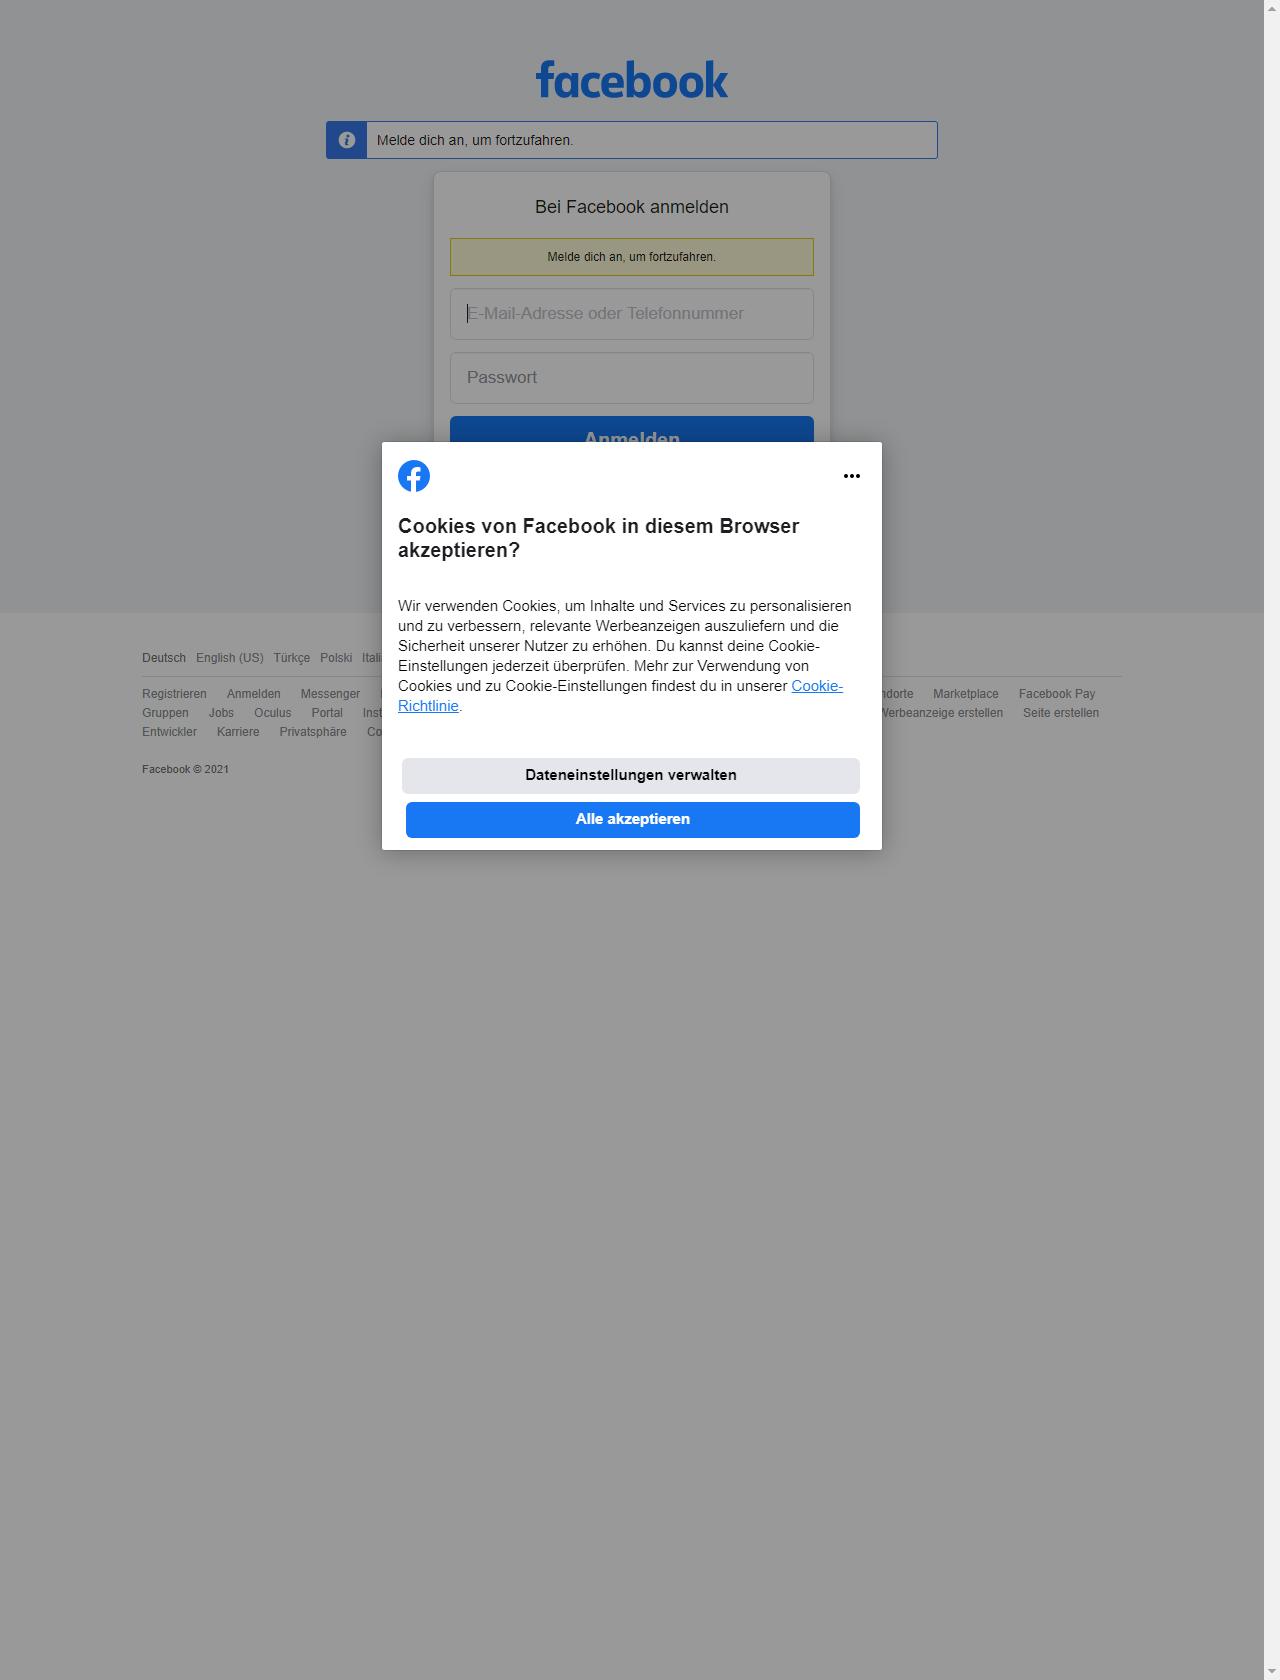 Screenshot Desktop - https://www.facebook.com/login/?next=https%3A%2F%2Fwww.facebook.com%2Foticfoundation